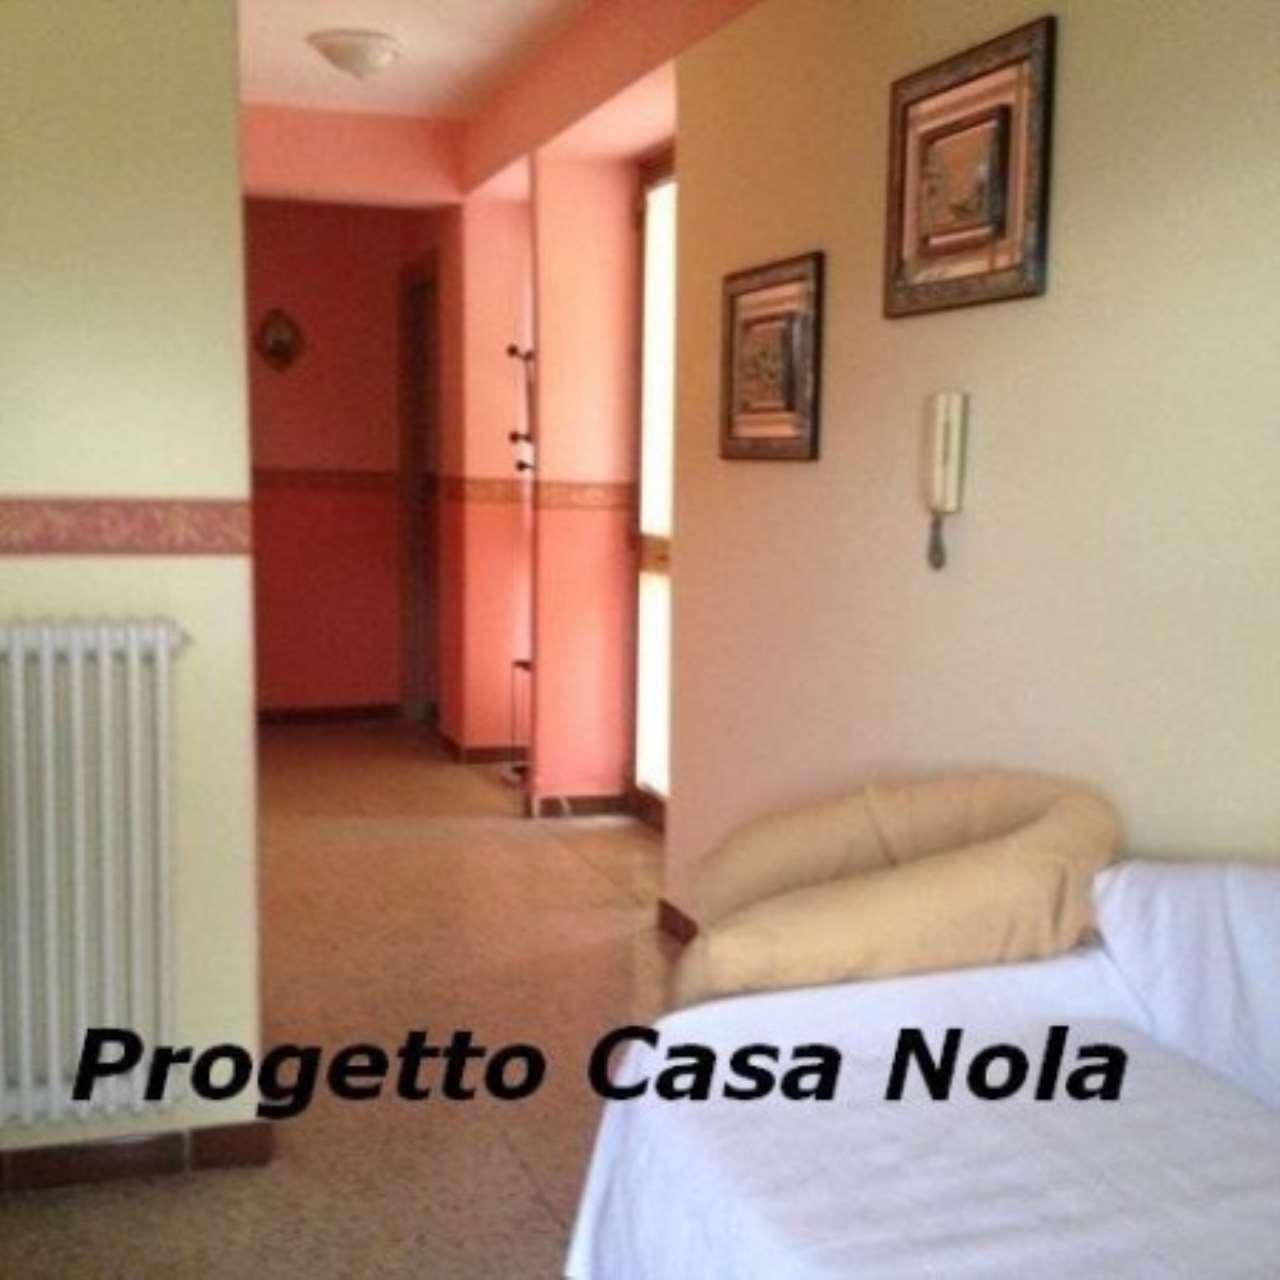 Appartamento, Giacomo Matteotti, 0, Vendita - Camposano